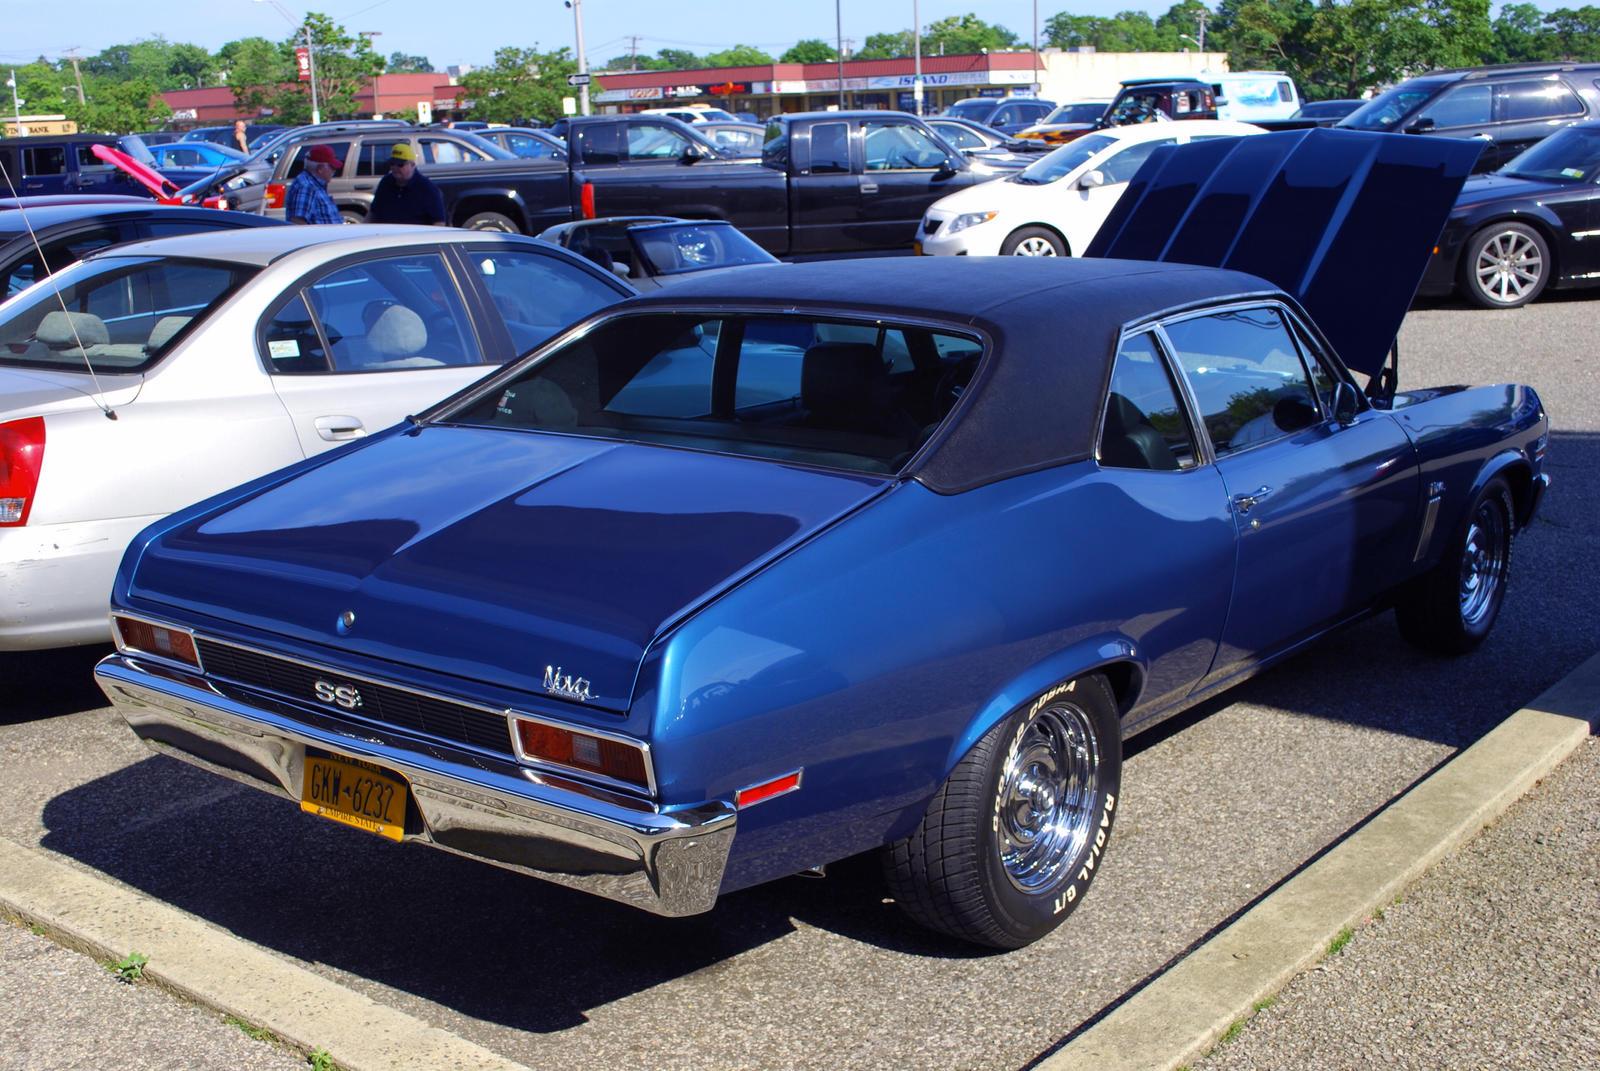 All Chevy 1971 chevrolet nova : 1971 CHEVROLET Nova SS (II) by HardRocker78 on DeviantArt